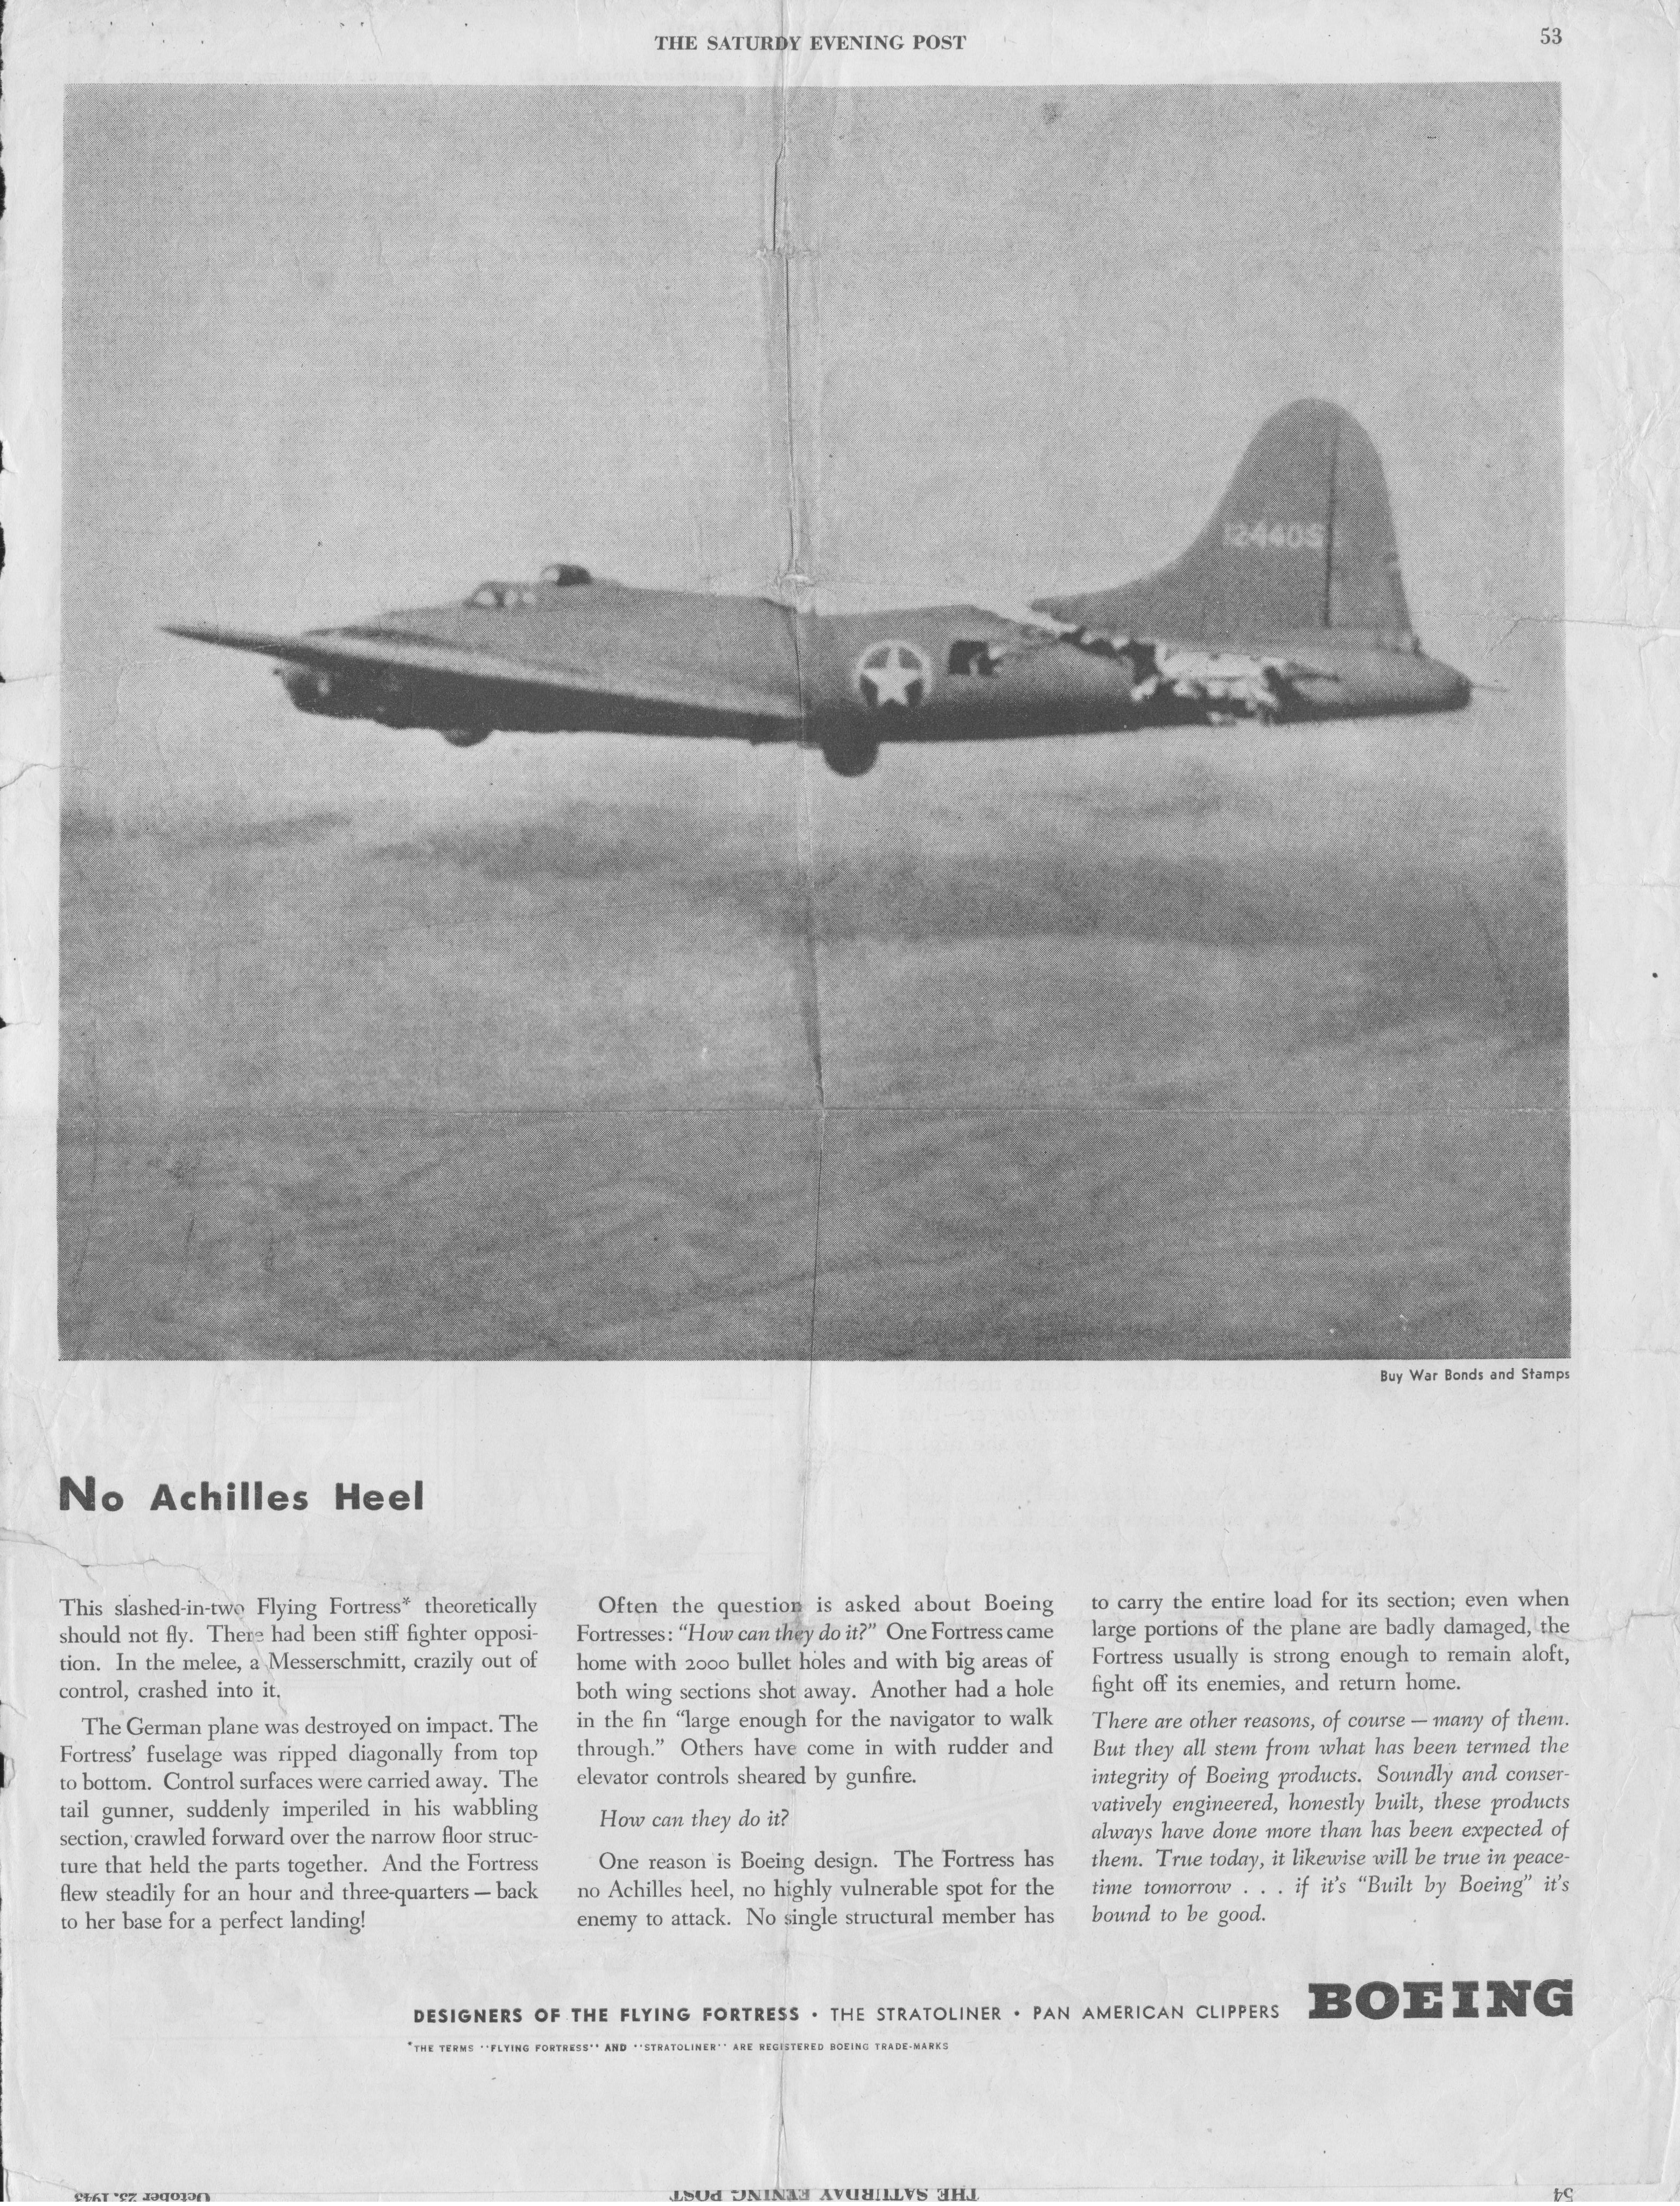 Image - 4) All American  B-17 BOEING Ad - SatEvPost Oct43.jpg